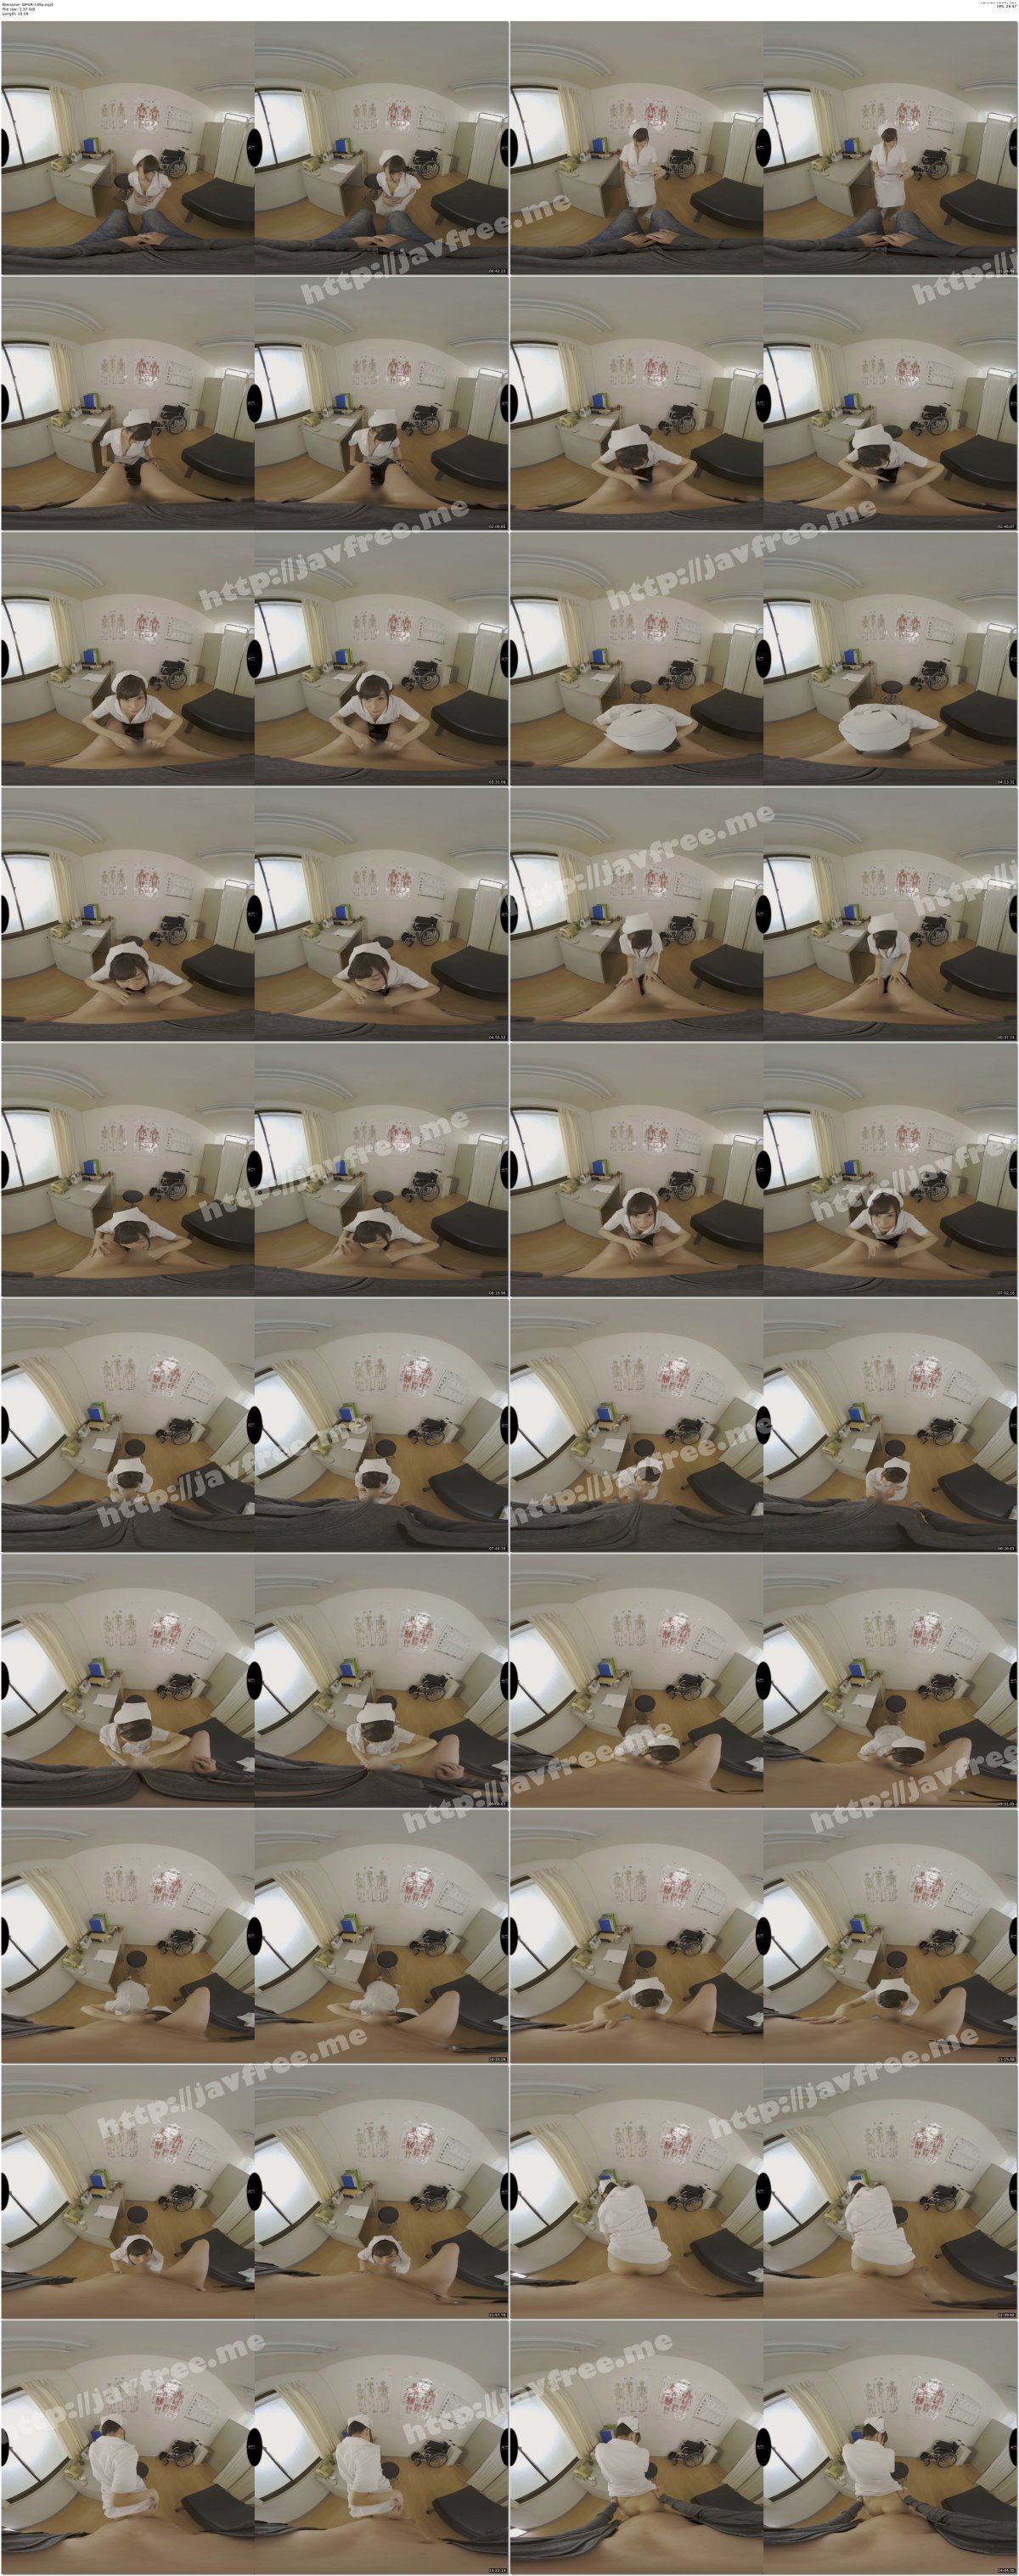 [WPVR-149] 【VR】包茎手術患者と病院で声ガマン性交…でも診察室で生はマズくない? 逢沢まりあ - image WPVR-149a on https://javfree.me